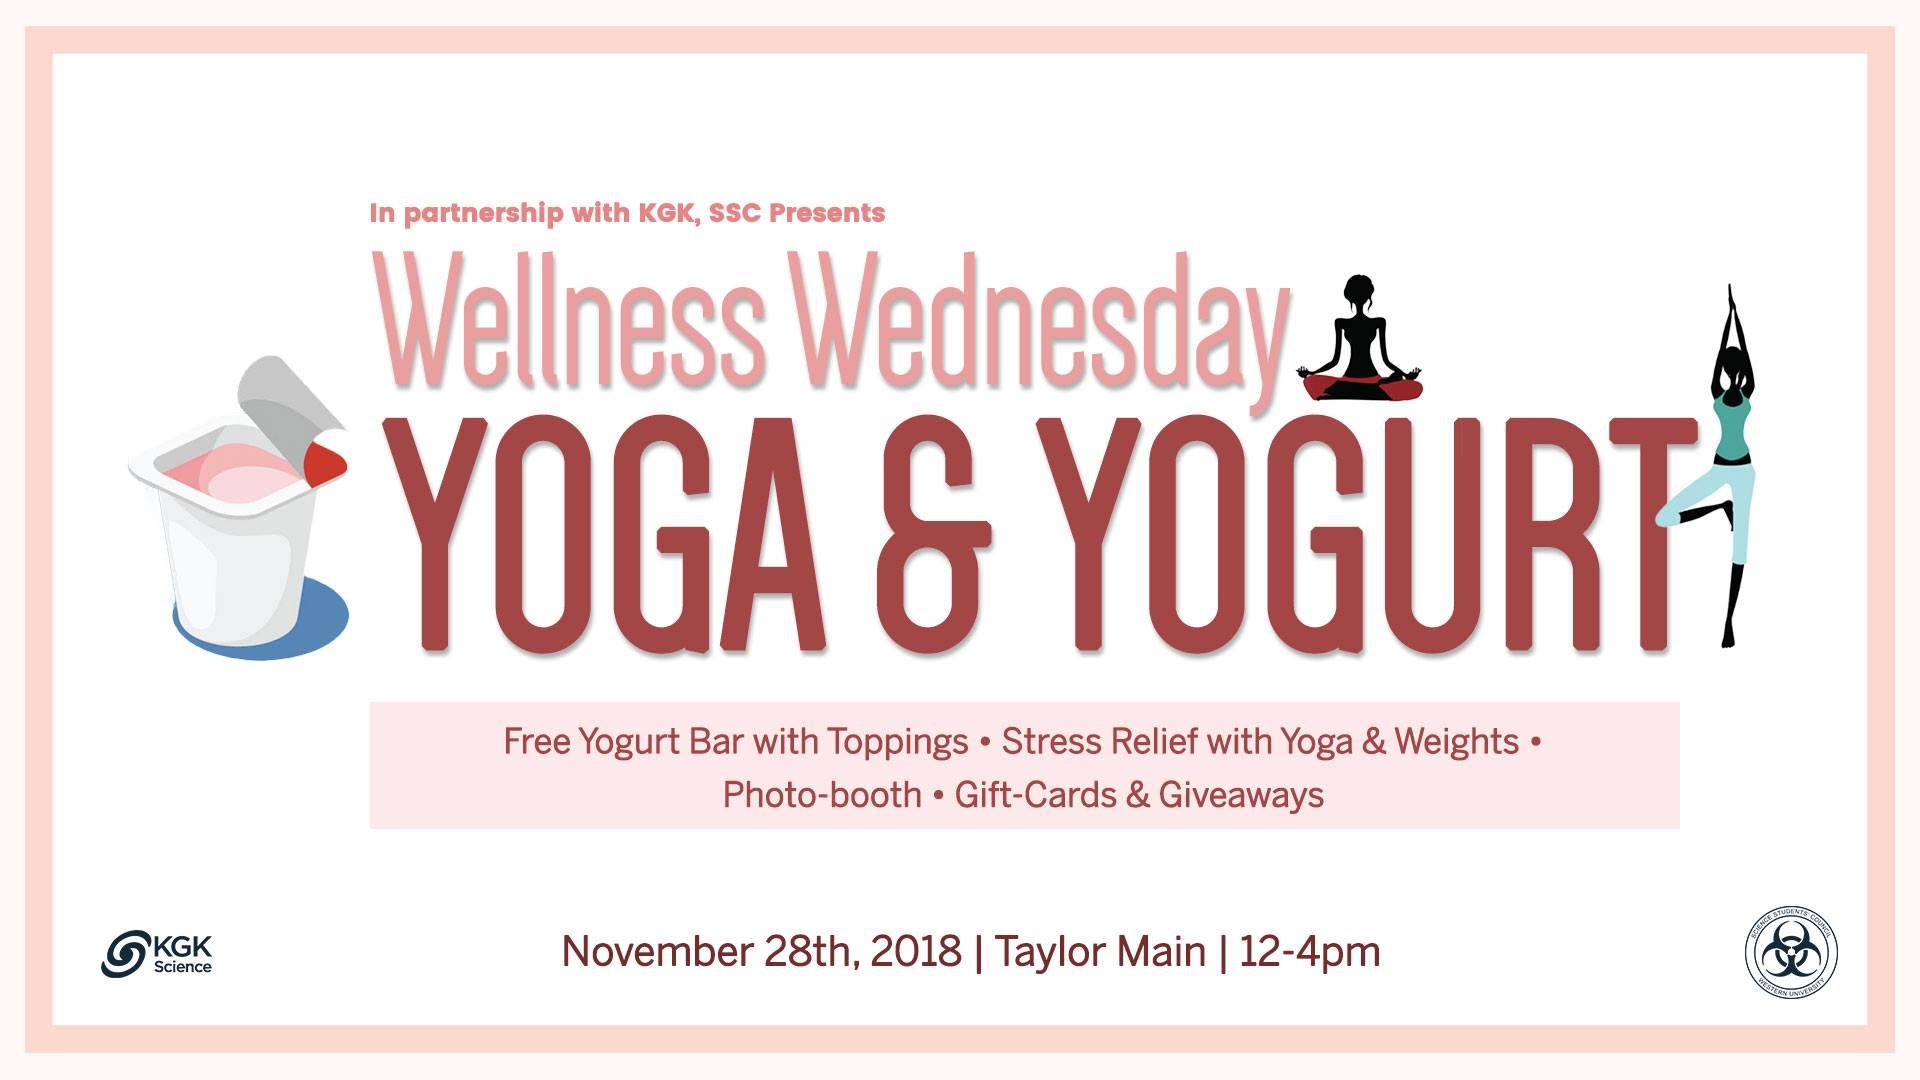 Yoga _ Yogurt.jpg